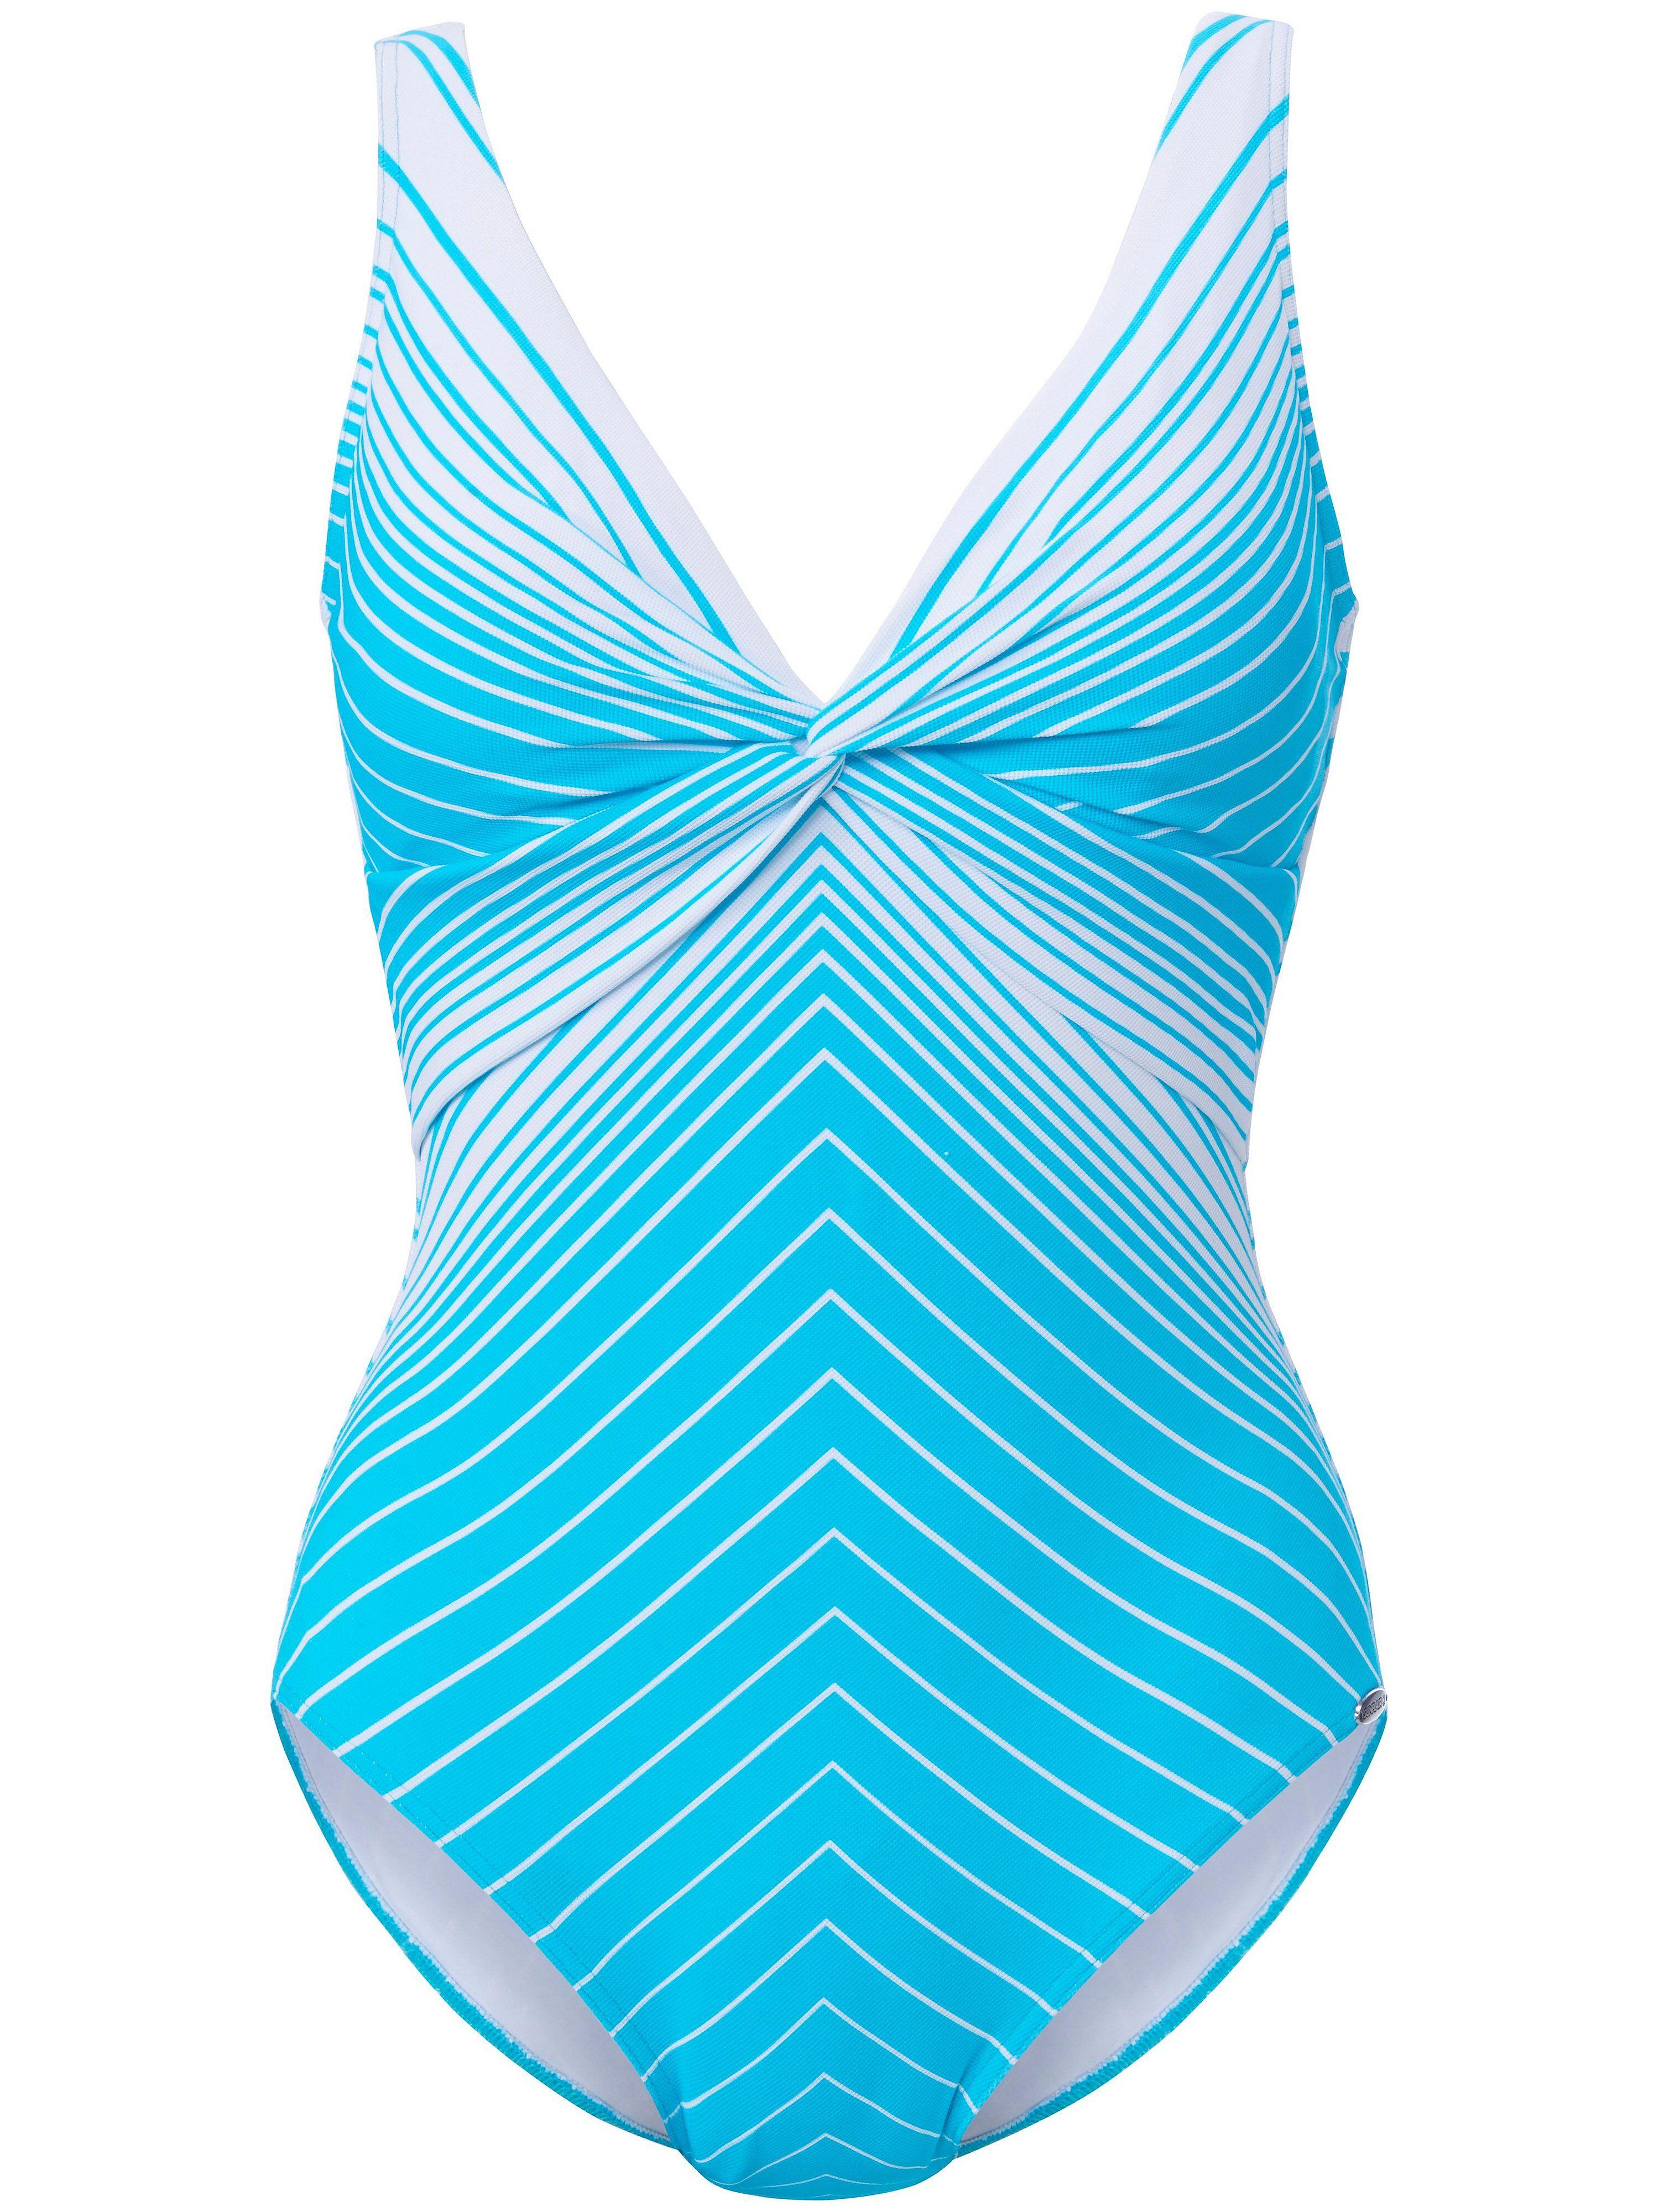 Sunflair Le maillot bain à coques souples  Sunflair turquoise  - Femme - 42